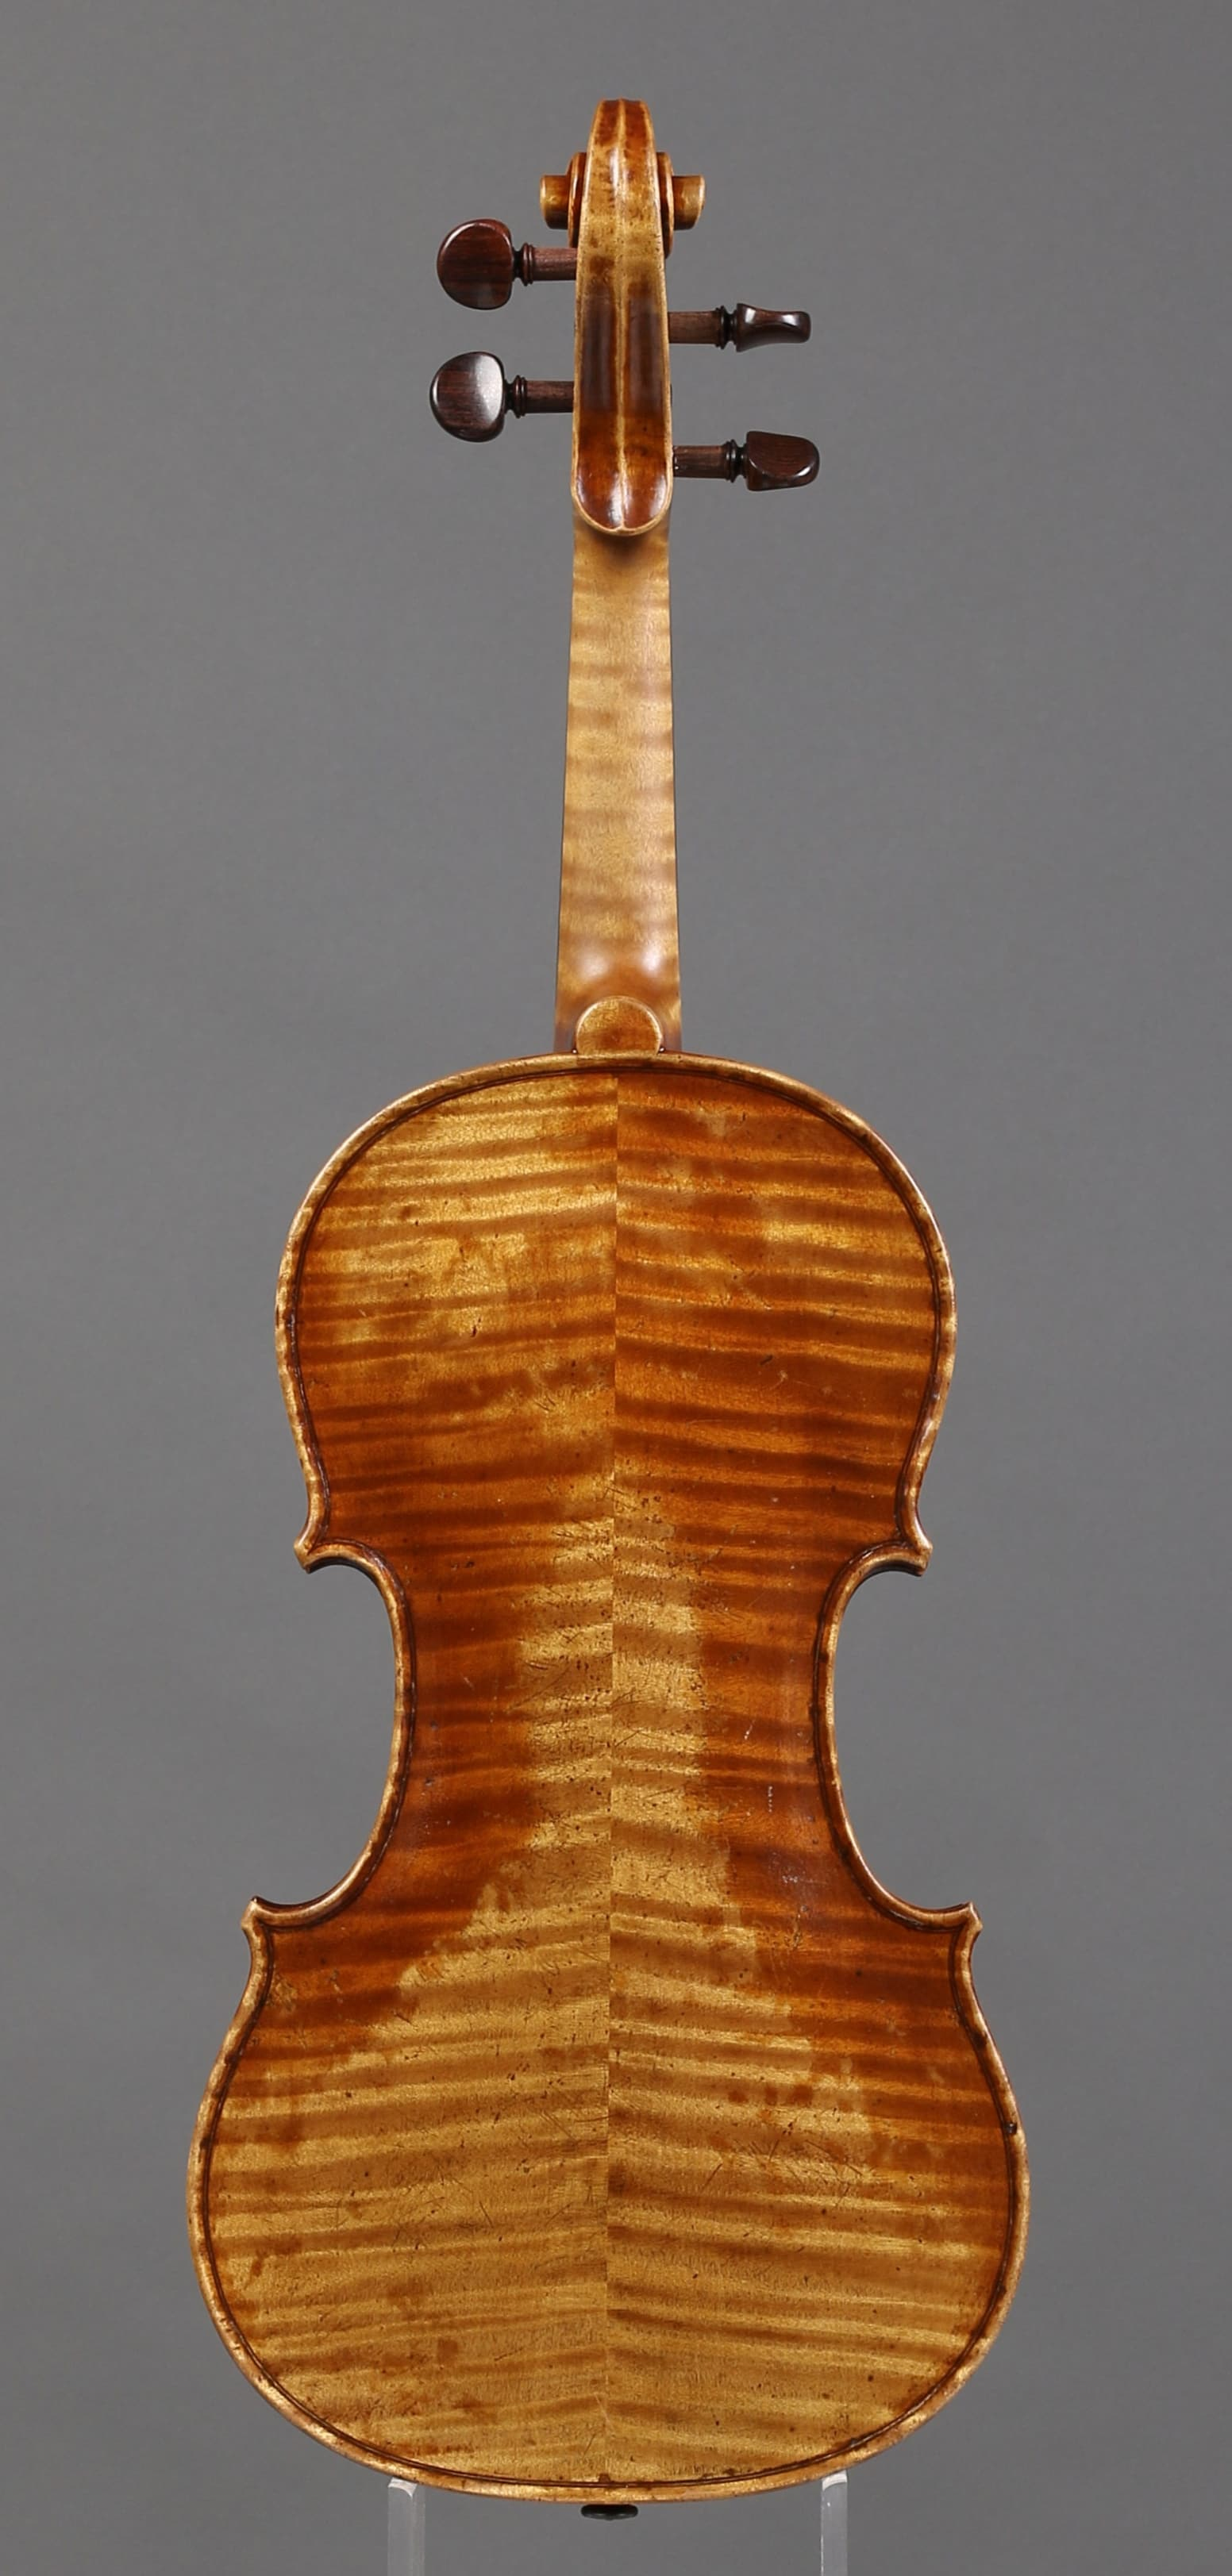 Strings_Music_Horizons_Felix_Krafft_violin_for_sale_back66